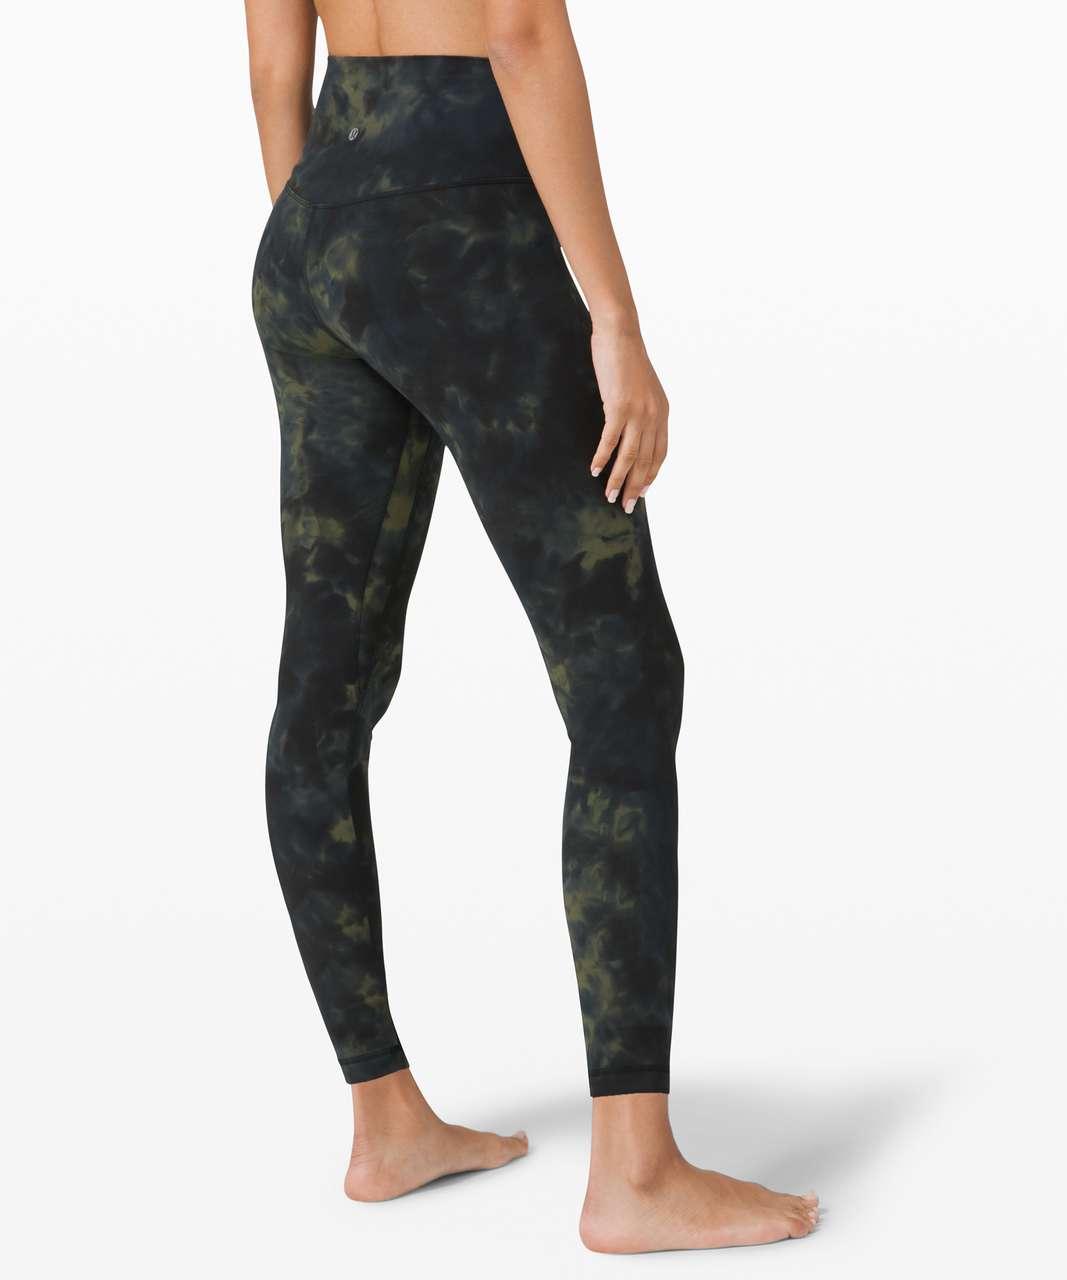 "Lululemon Align Pant 25"" *Diamond Dye - Diamond Dye Graphite Grey Bronze Green"